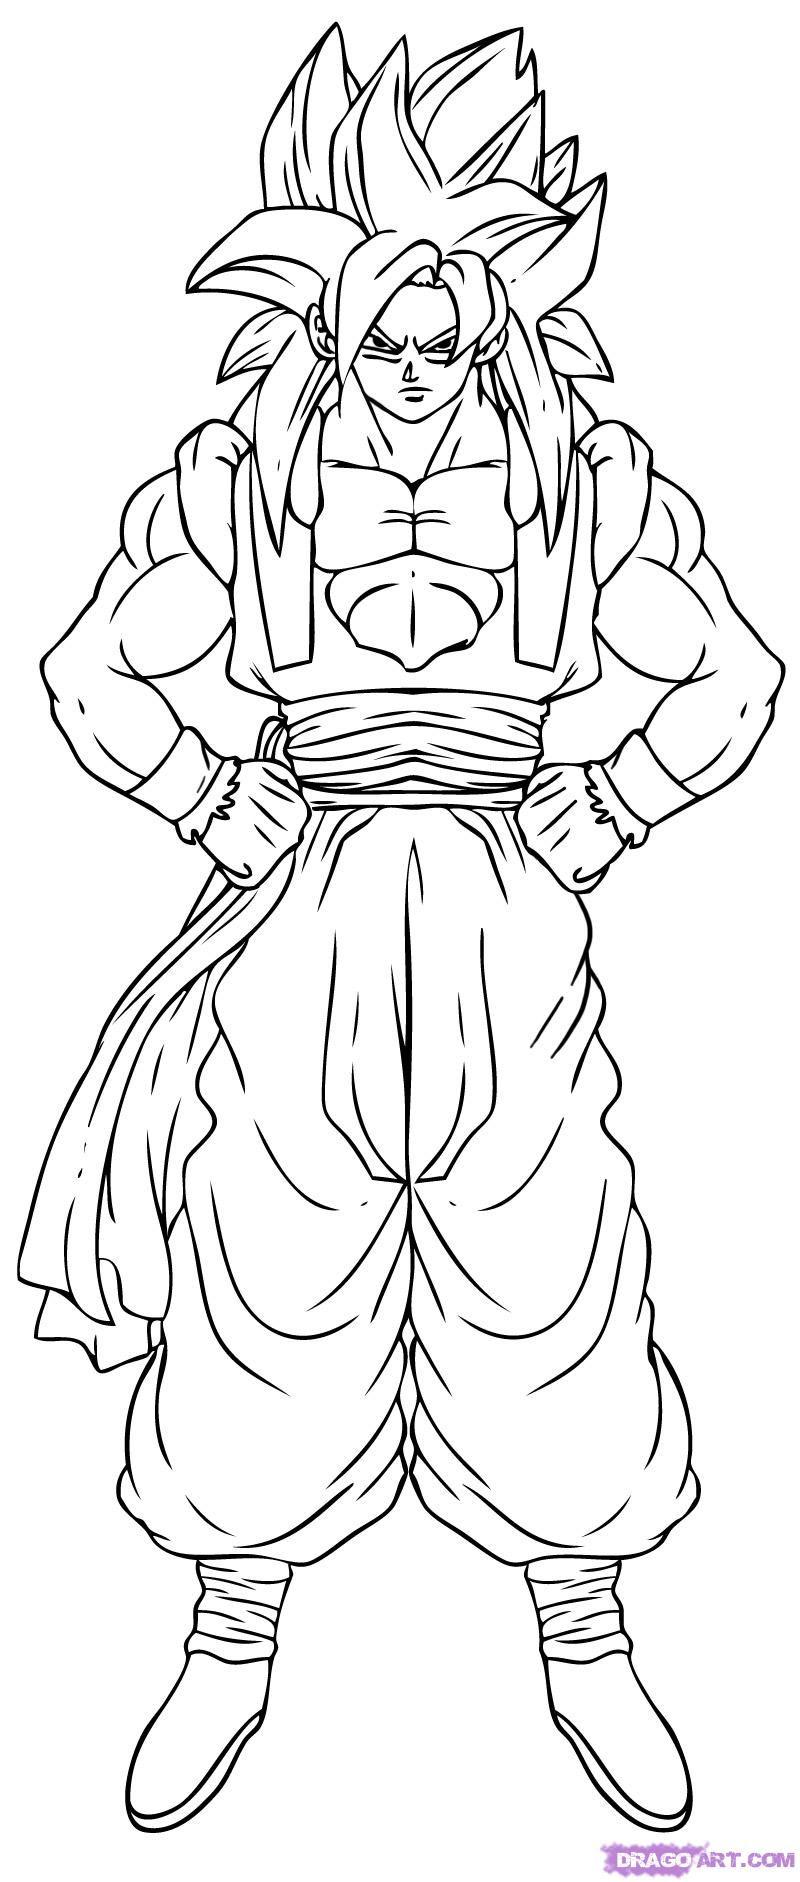 Gogeta Ssj4 Bueno Fusiones De Dragon Ball Y Ssj De